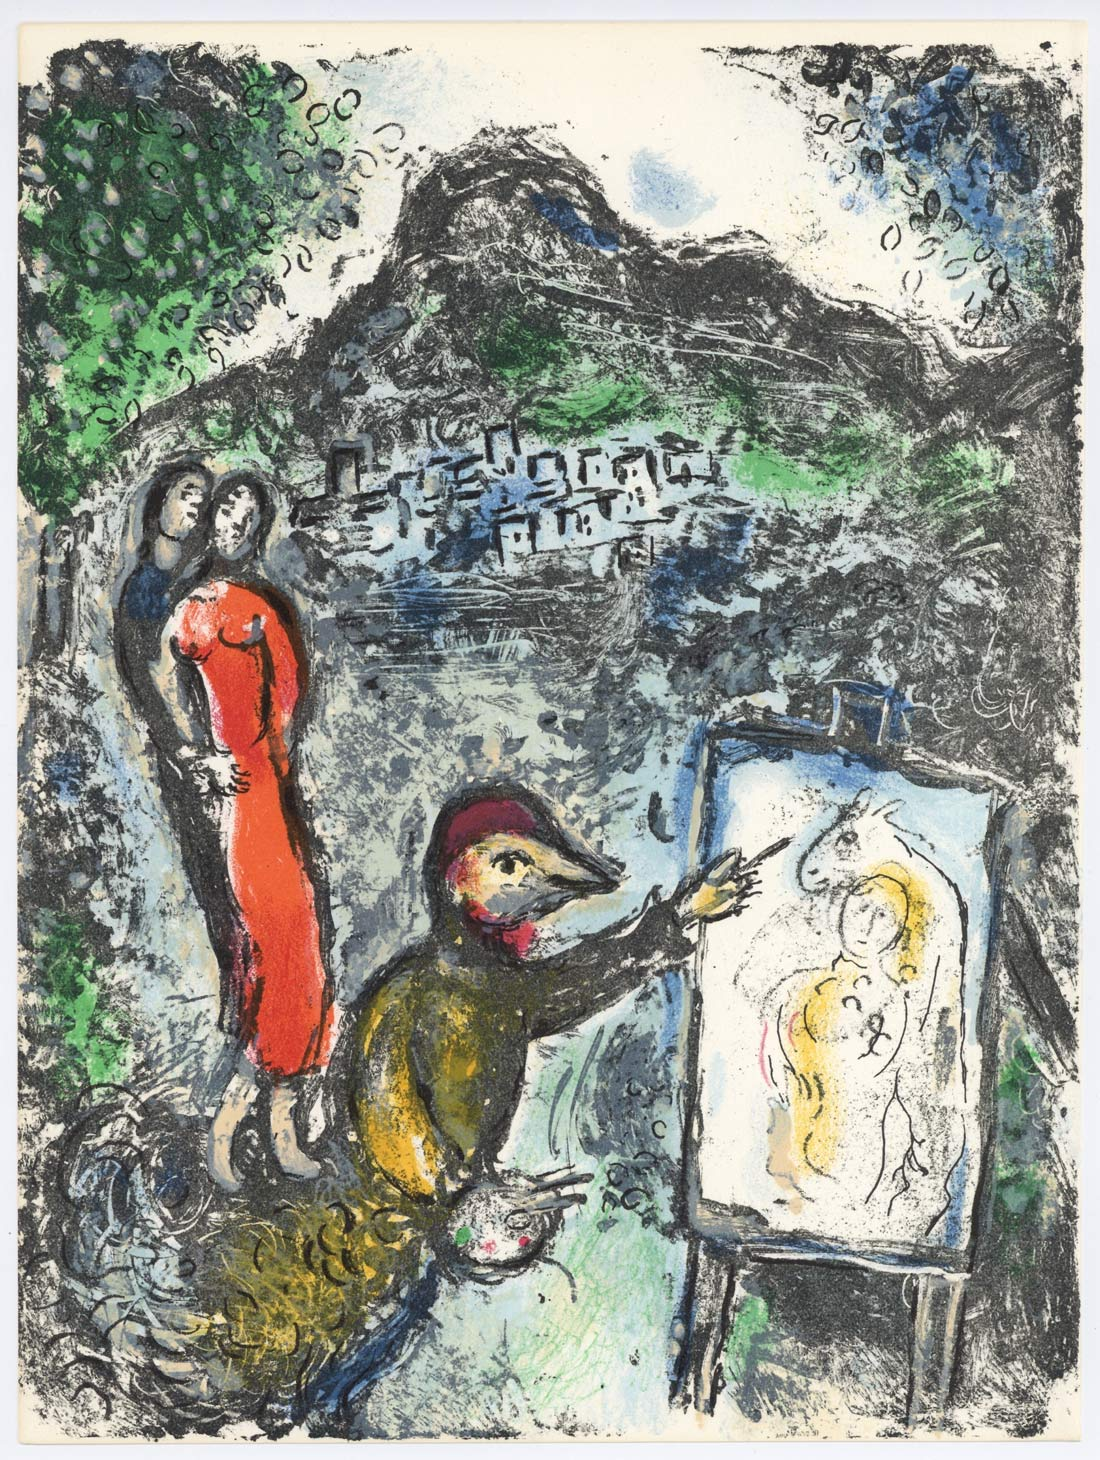 Devant Saint Jeannet Marc Chagall